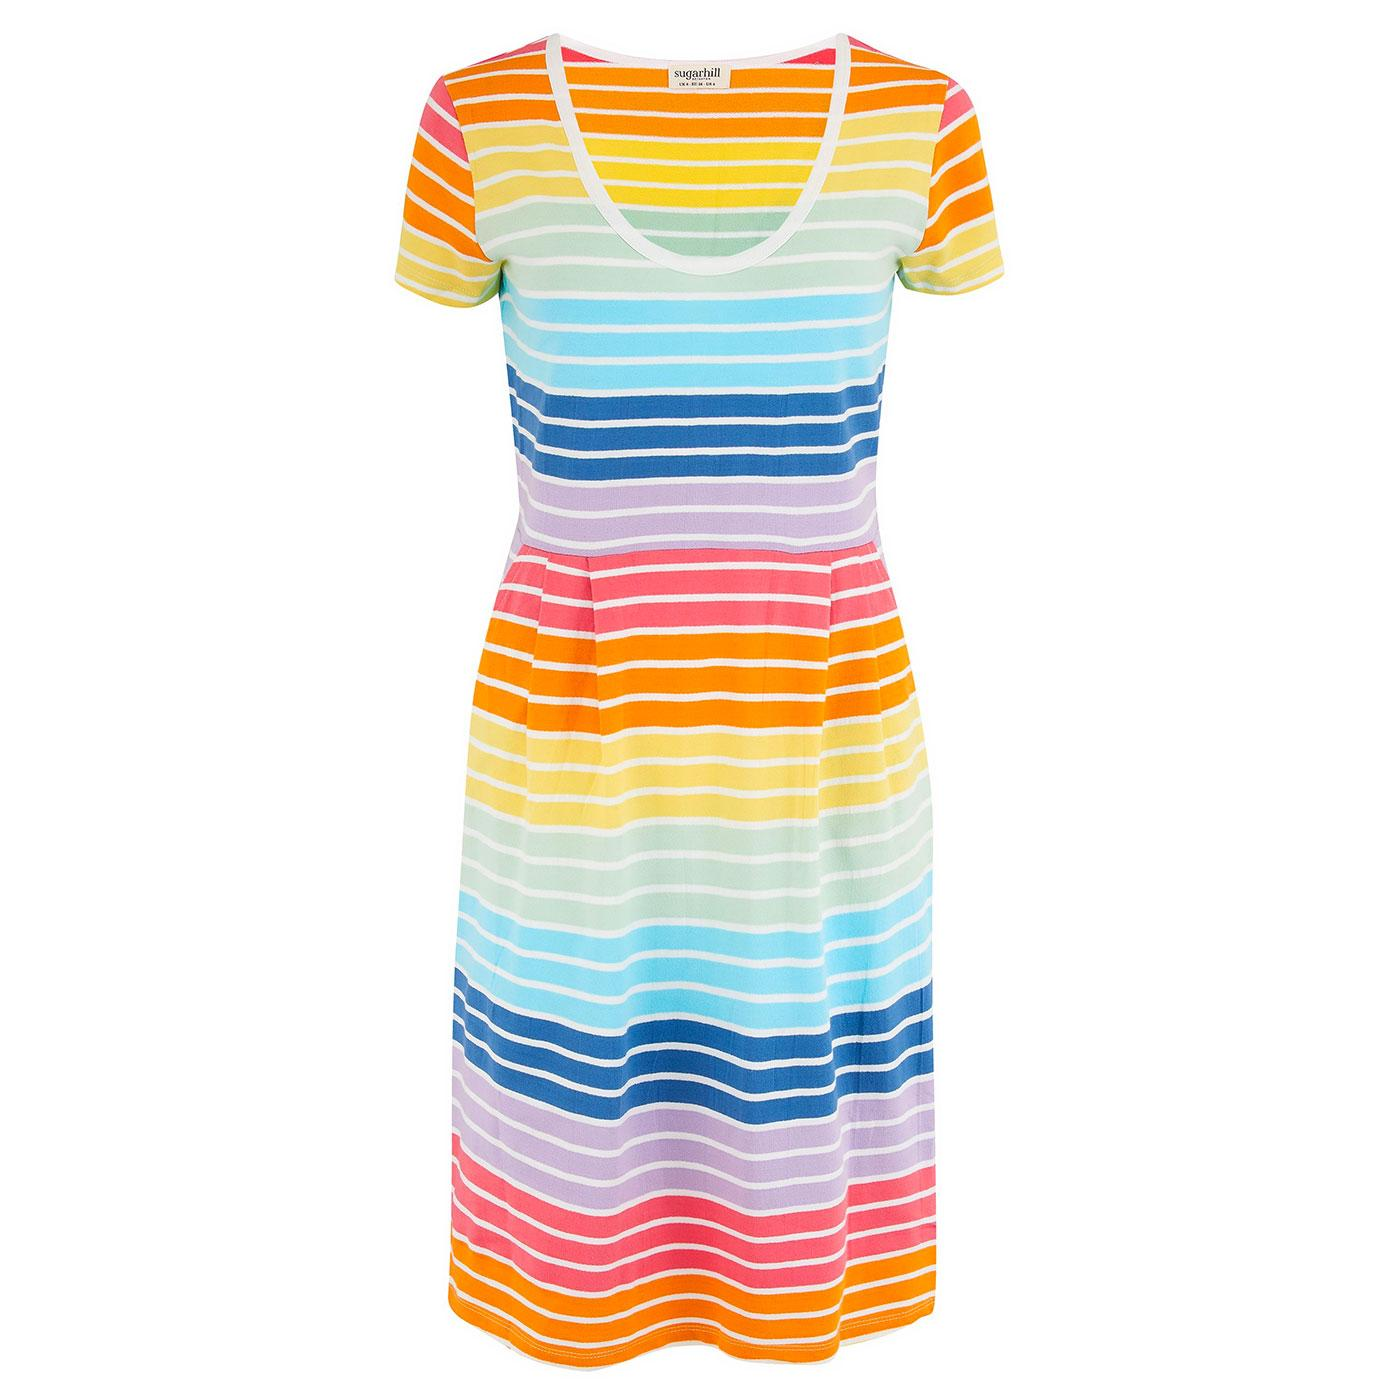 Liliana SUGARHILL Retro Daylight Spectrum Dress